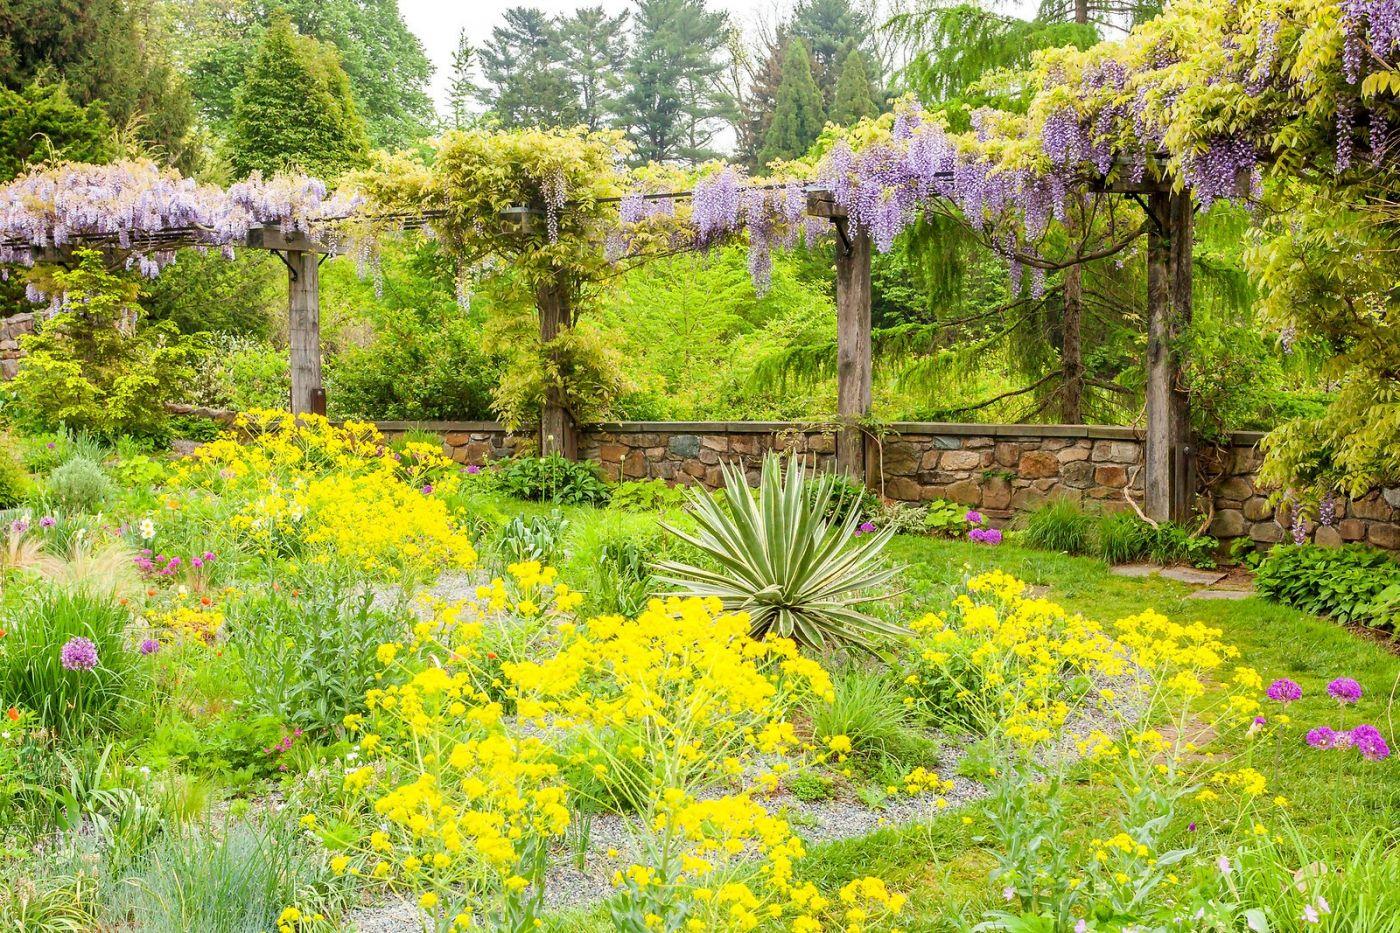 Chanticleer花园,那年盛开的紫藤花_图1-2